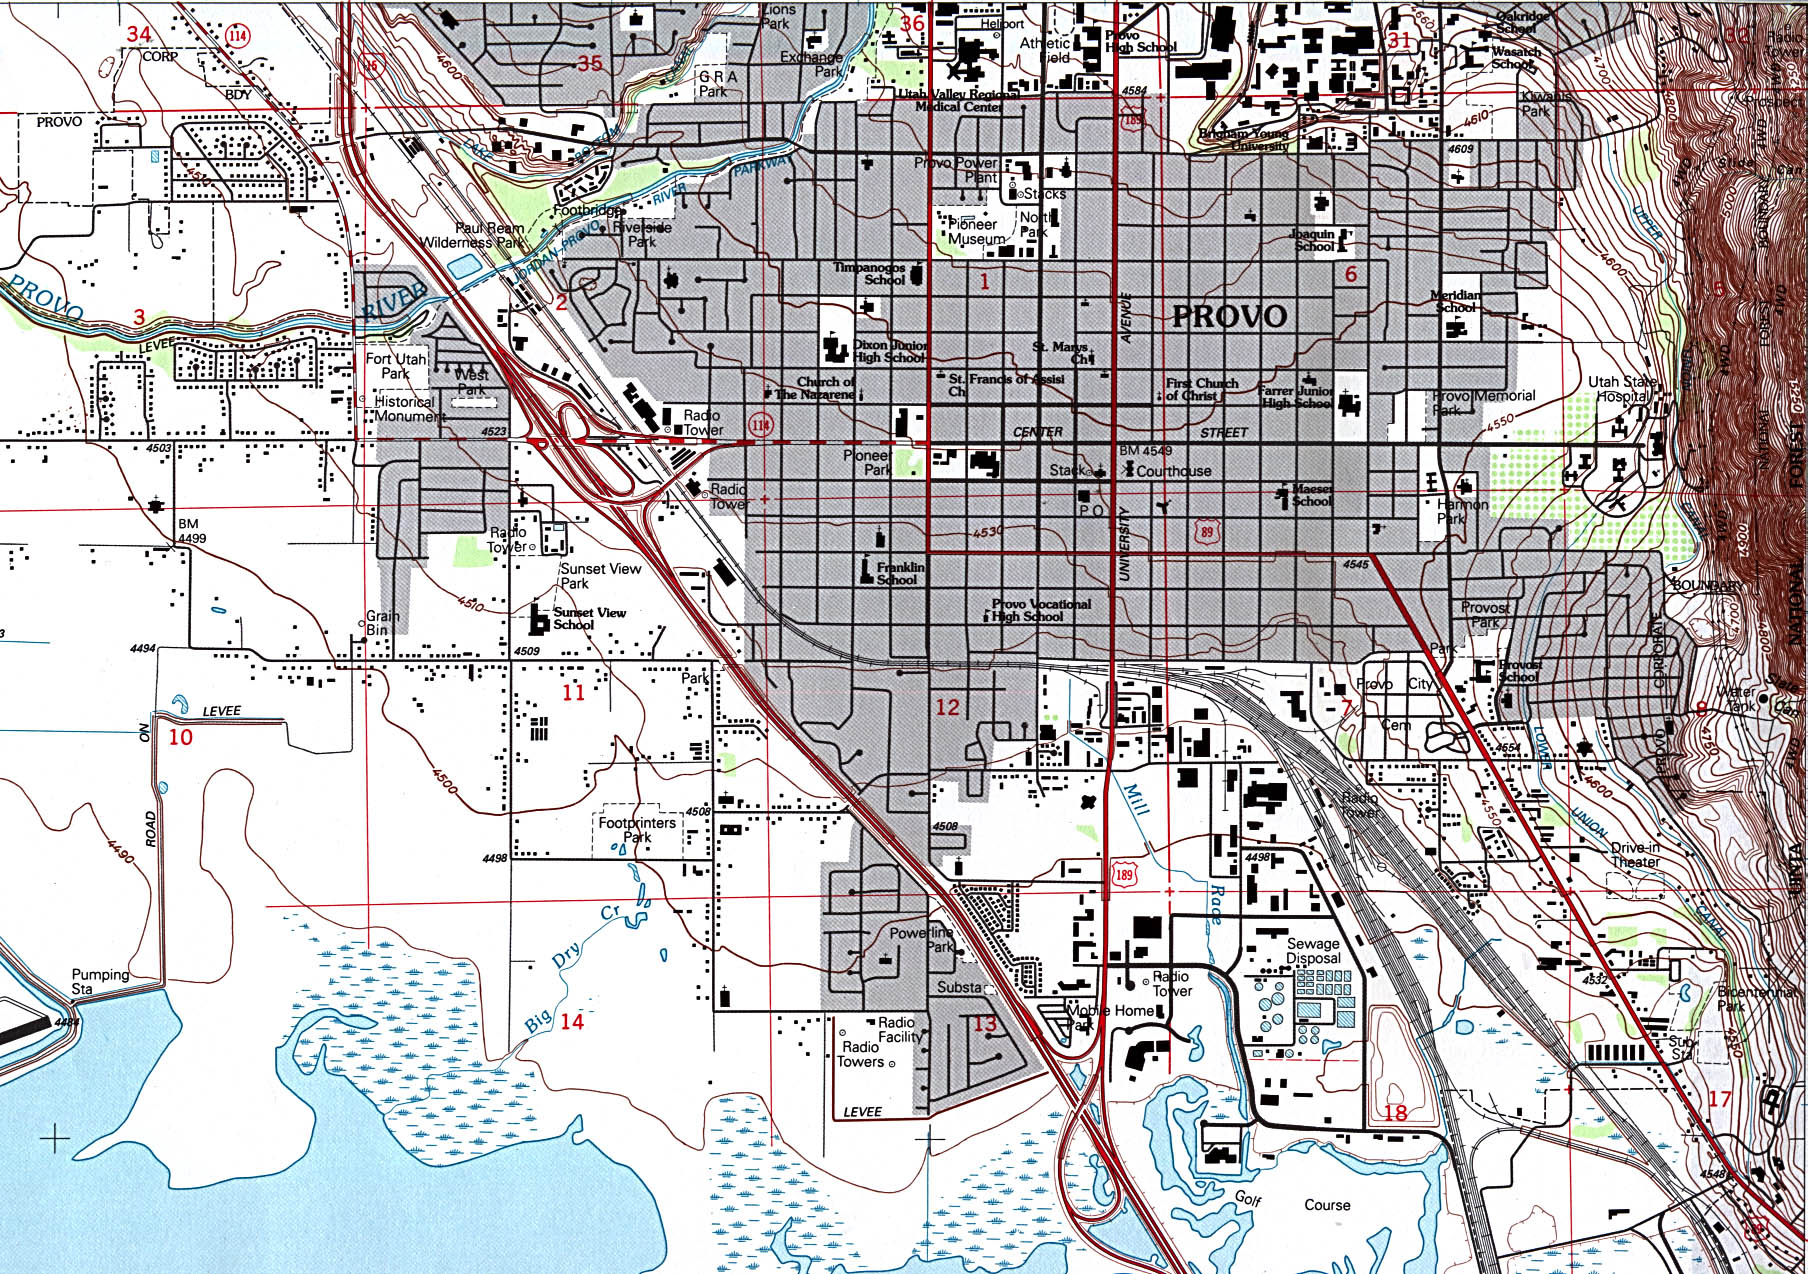 State Of Utah Mapsof Interstate Highways Cities Typography - Utah road map